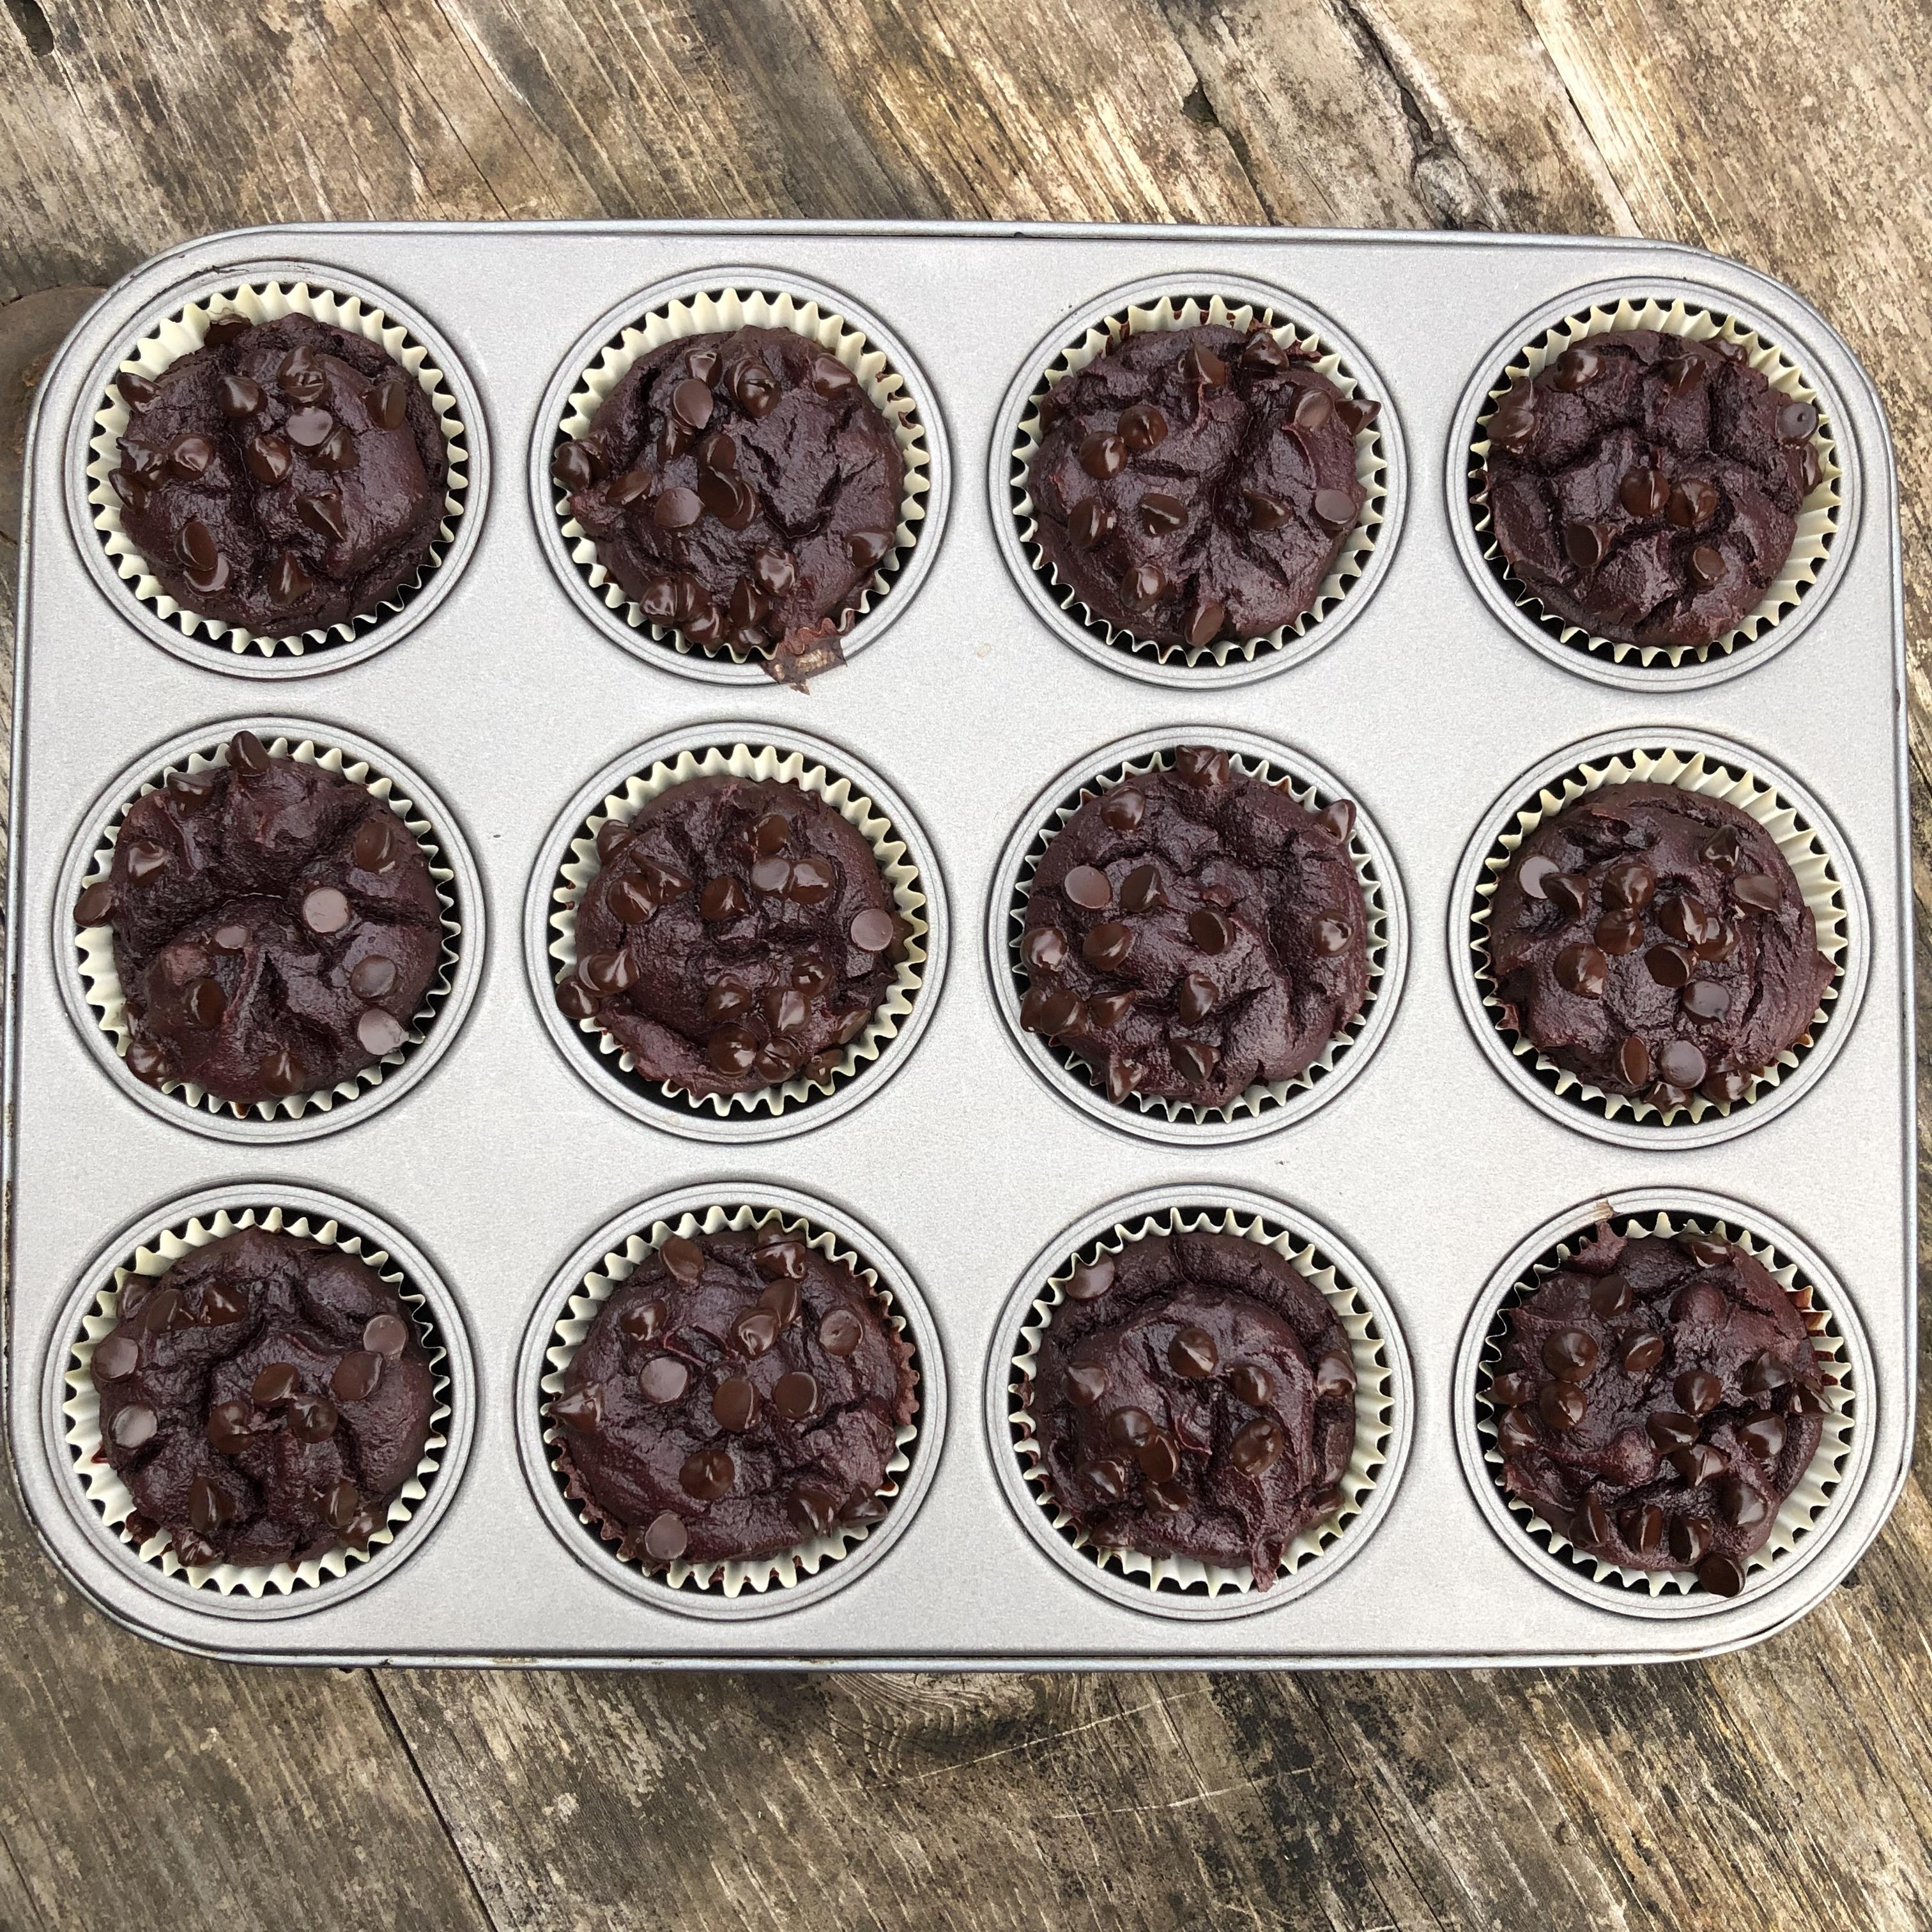 Chocolate Espresso Super Muffins, No Foolin' (Paleo, No Sugar)